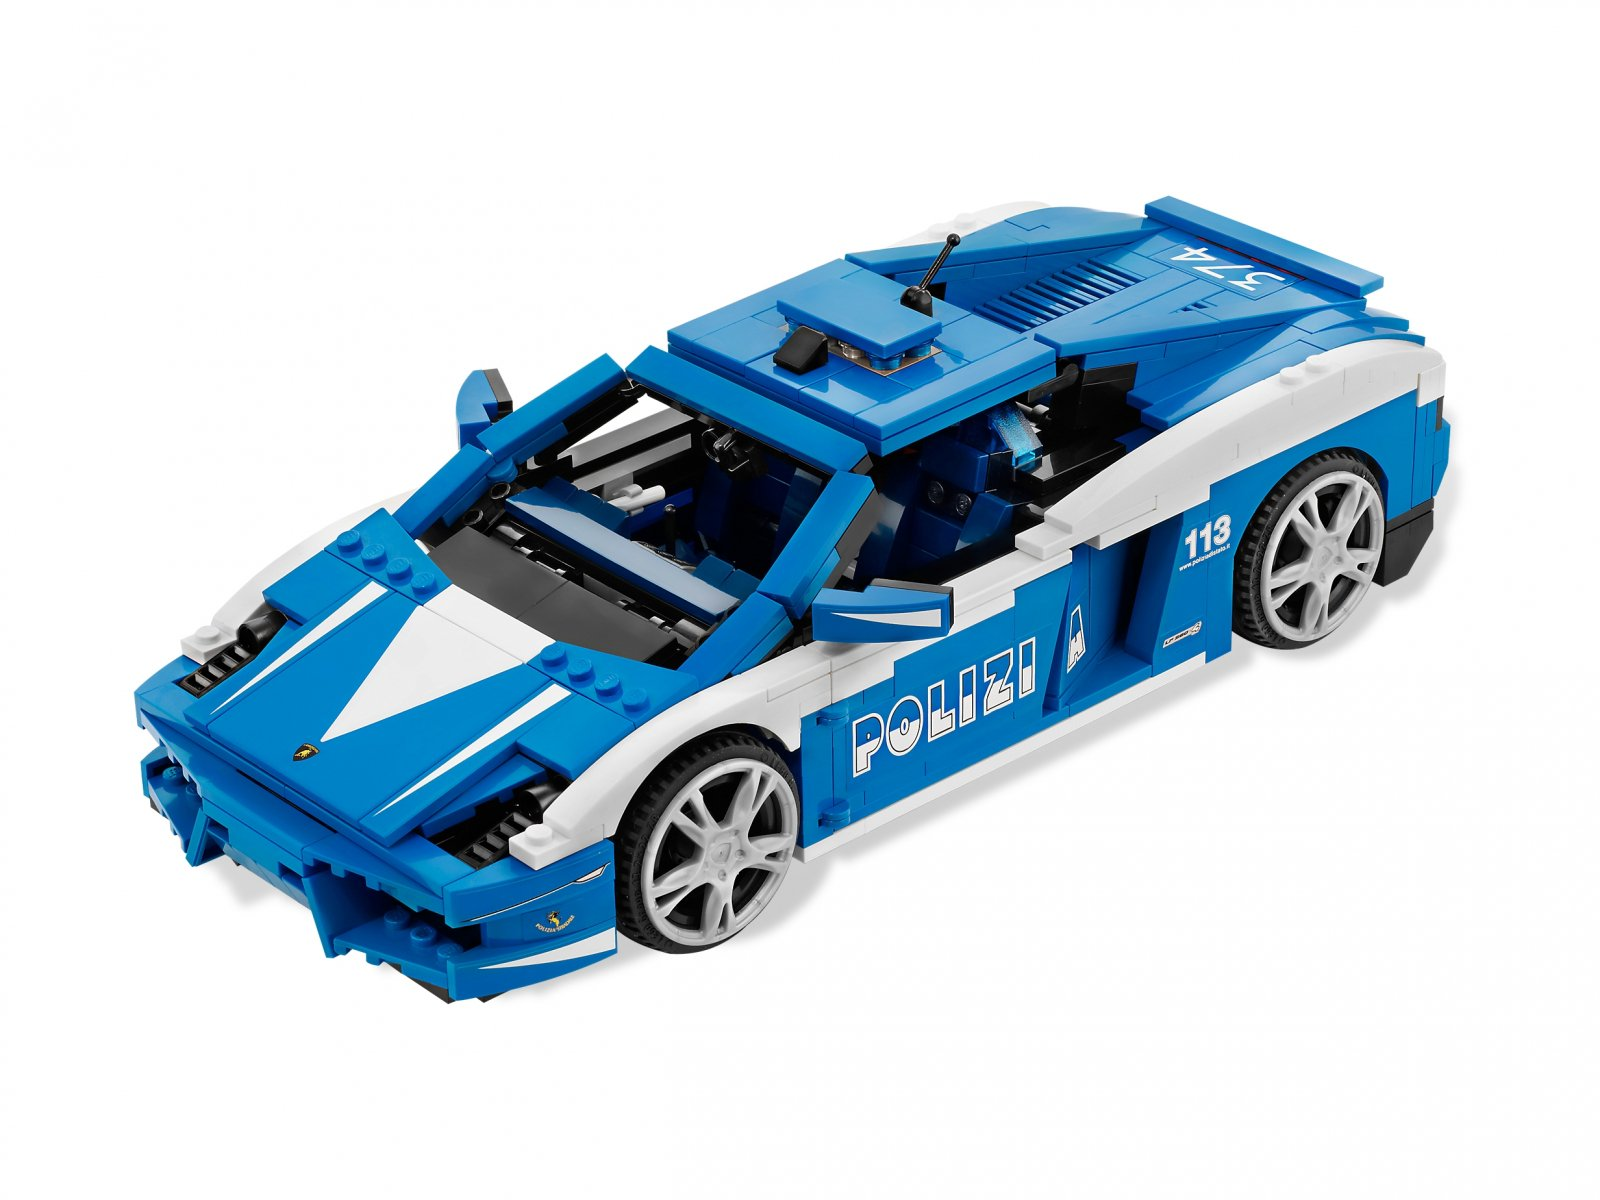 LEGO 8214 Racers Gallardo LP 560-4 Polizia